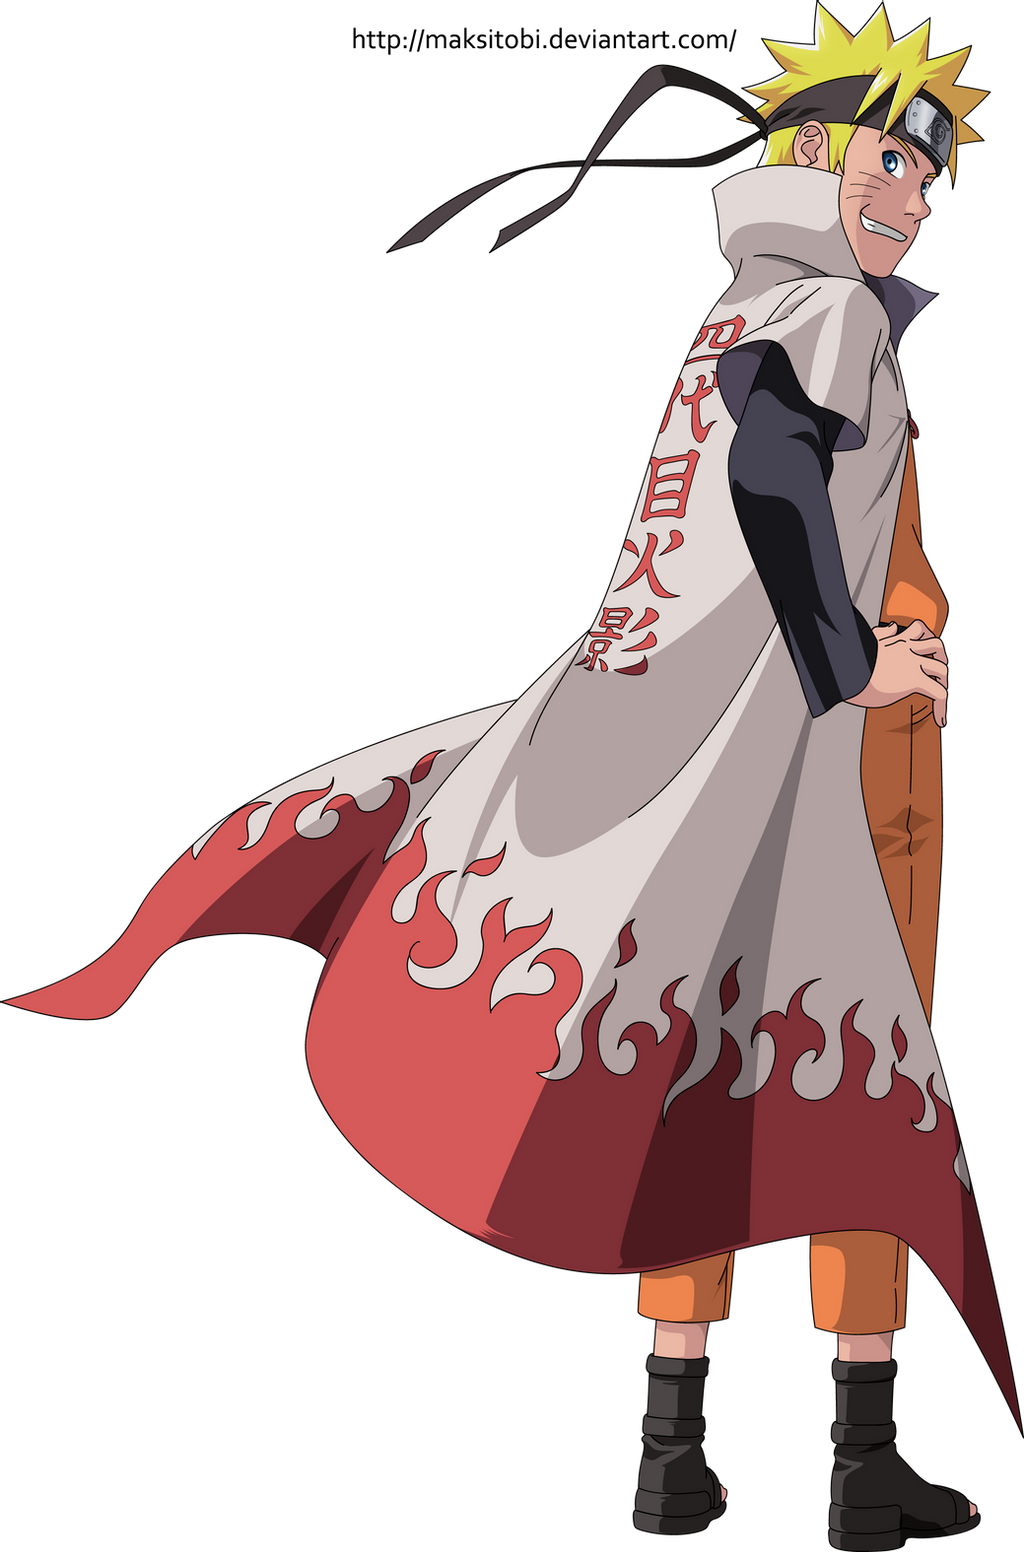 Naruto hokage by Epistafy on DeviantArt - Sasuke as Hokage